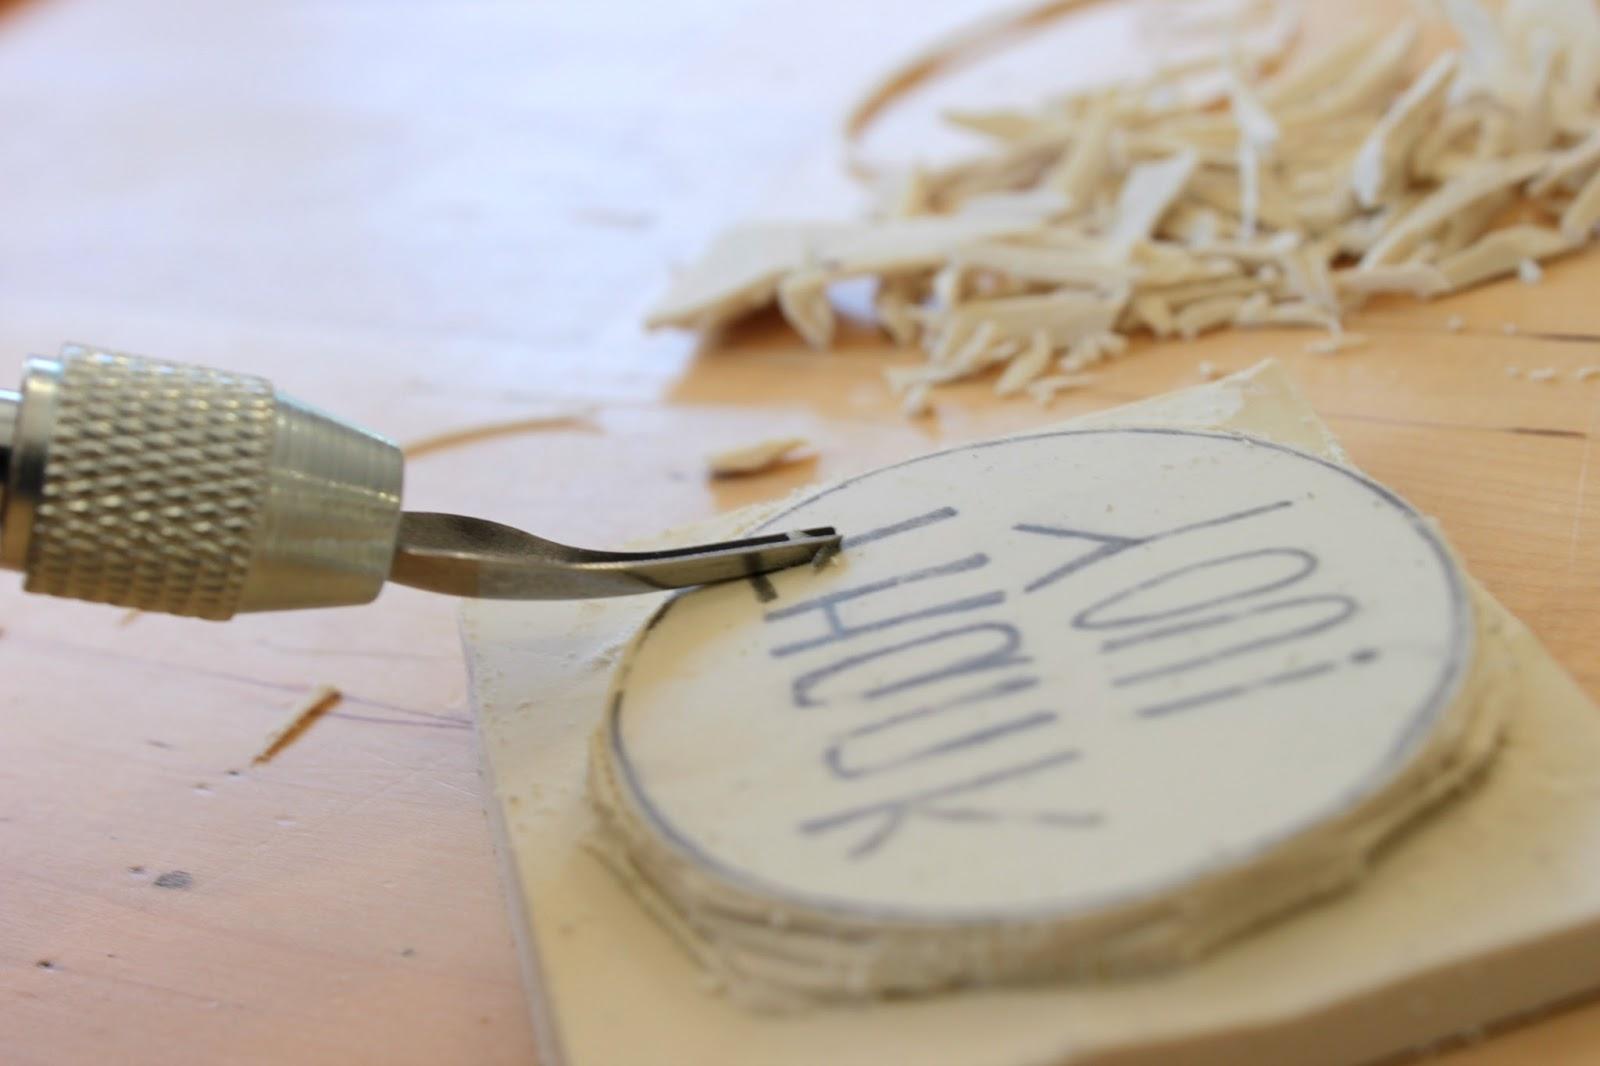 Se busca intercambio de dibu-producto por sello hecho a mano